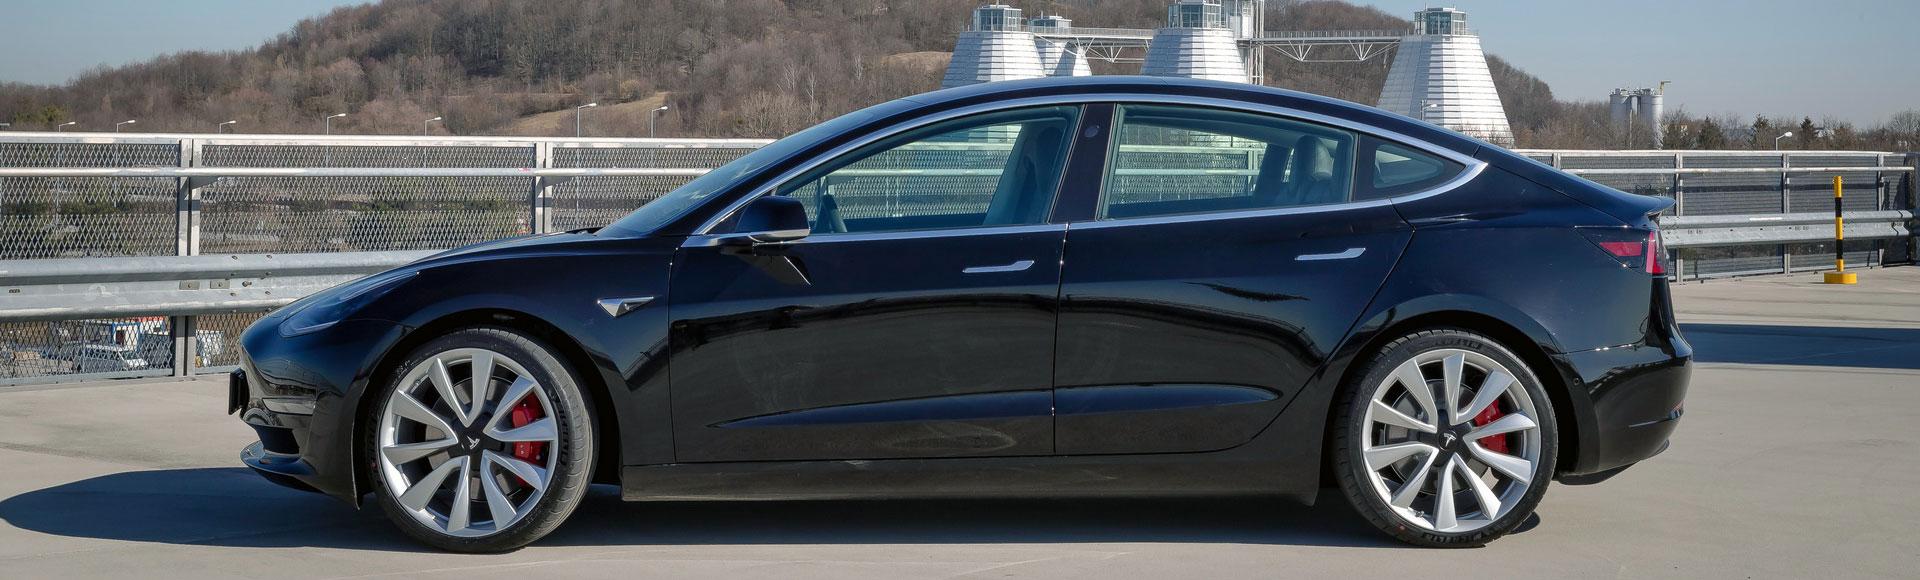 Tesla Model 3 2019 025